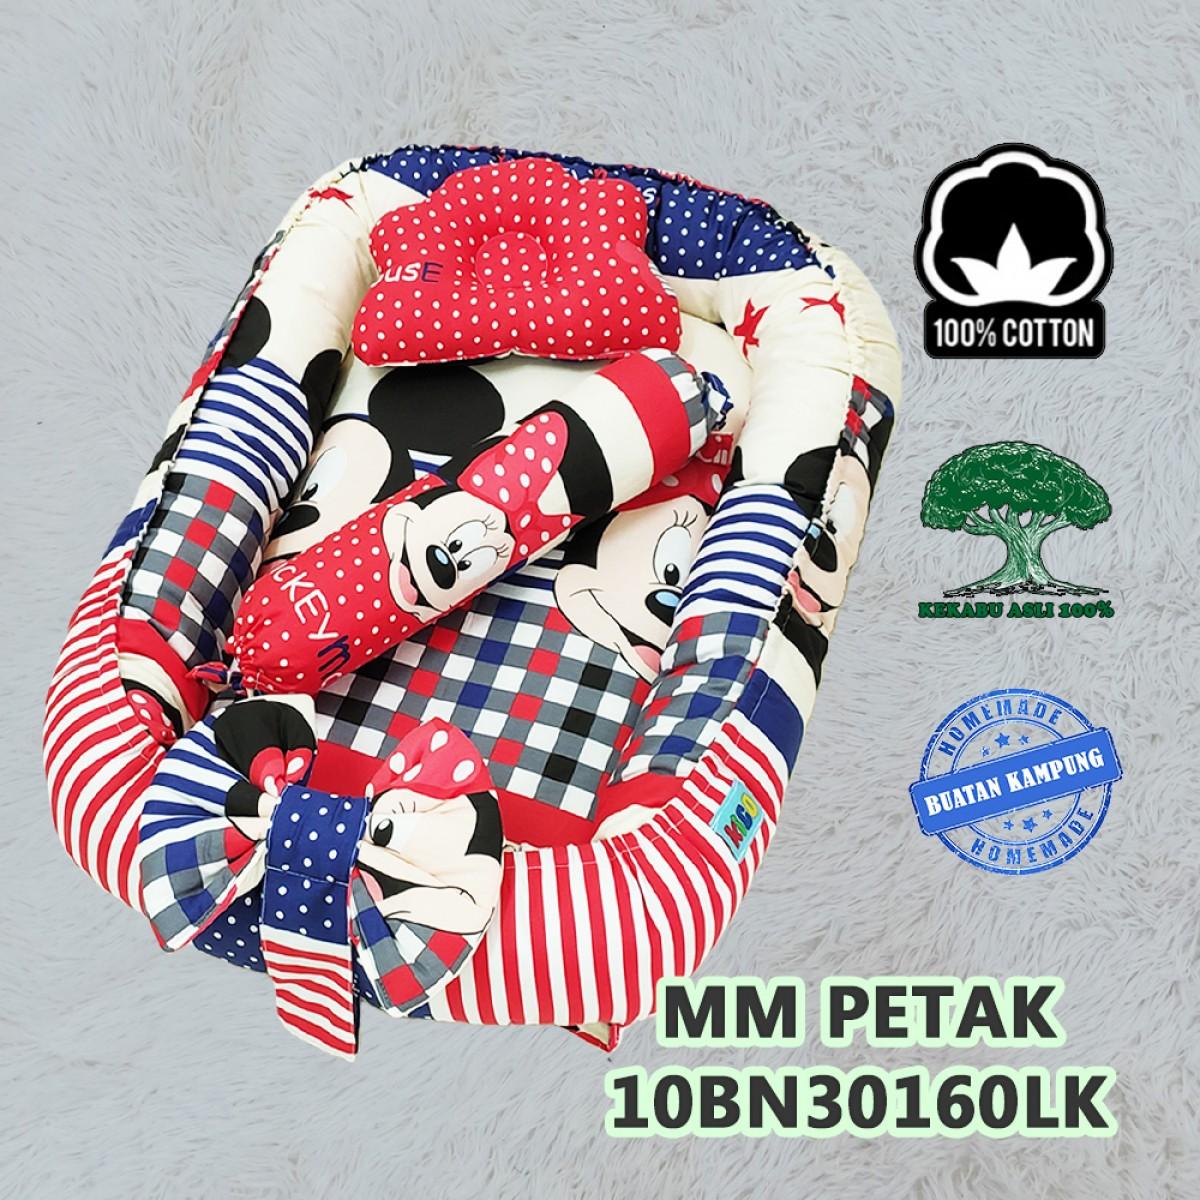 MM Petak - Kico Baby Center